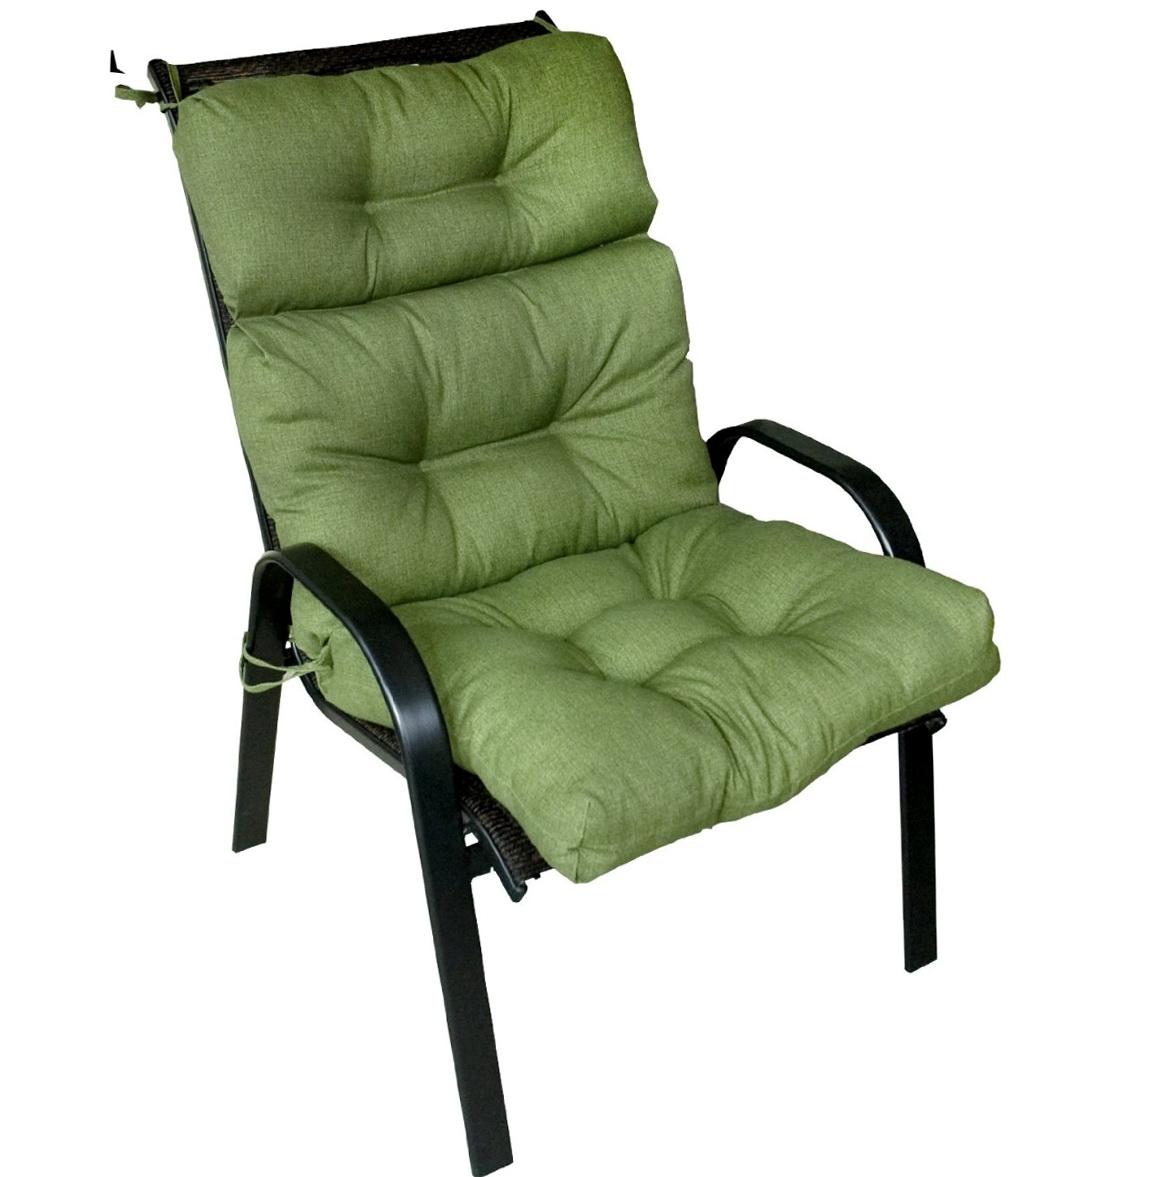 Patio Furniture Seat Cushions Clearance  Home Design Ideas